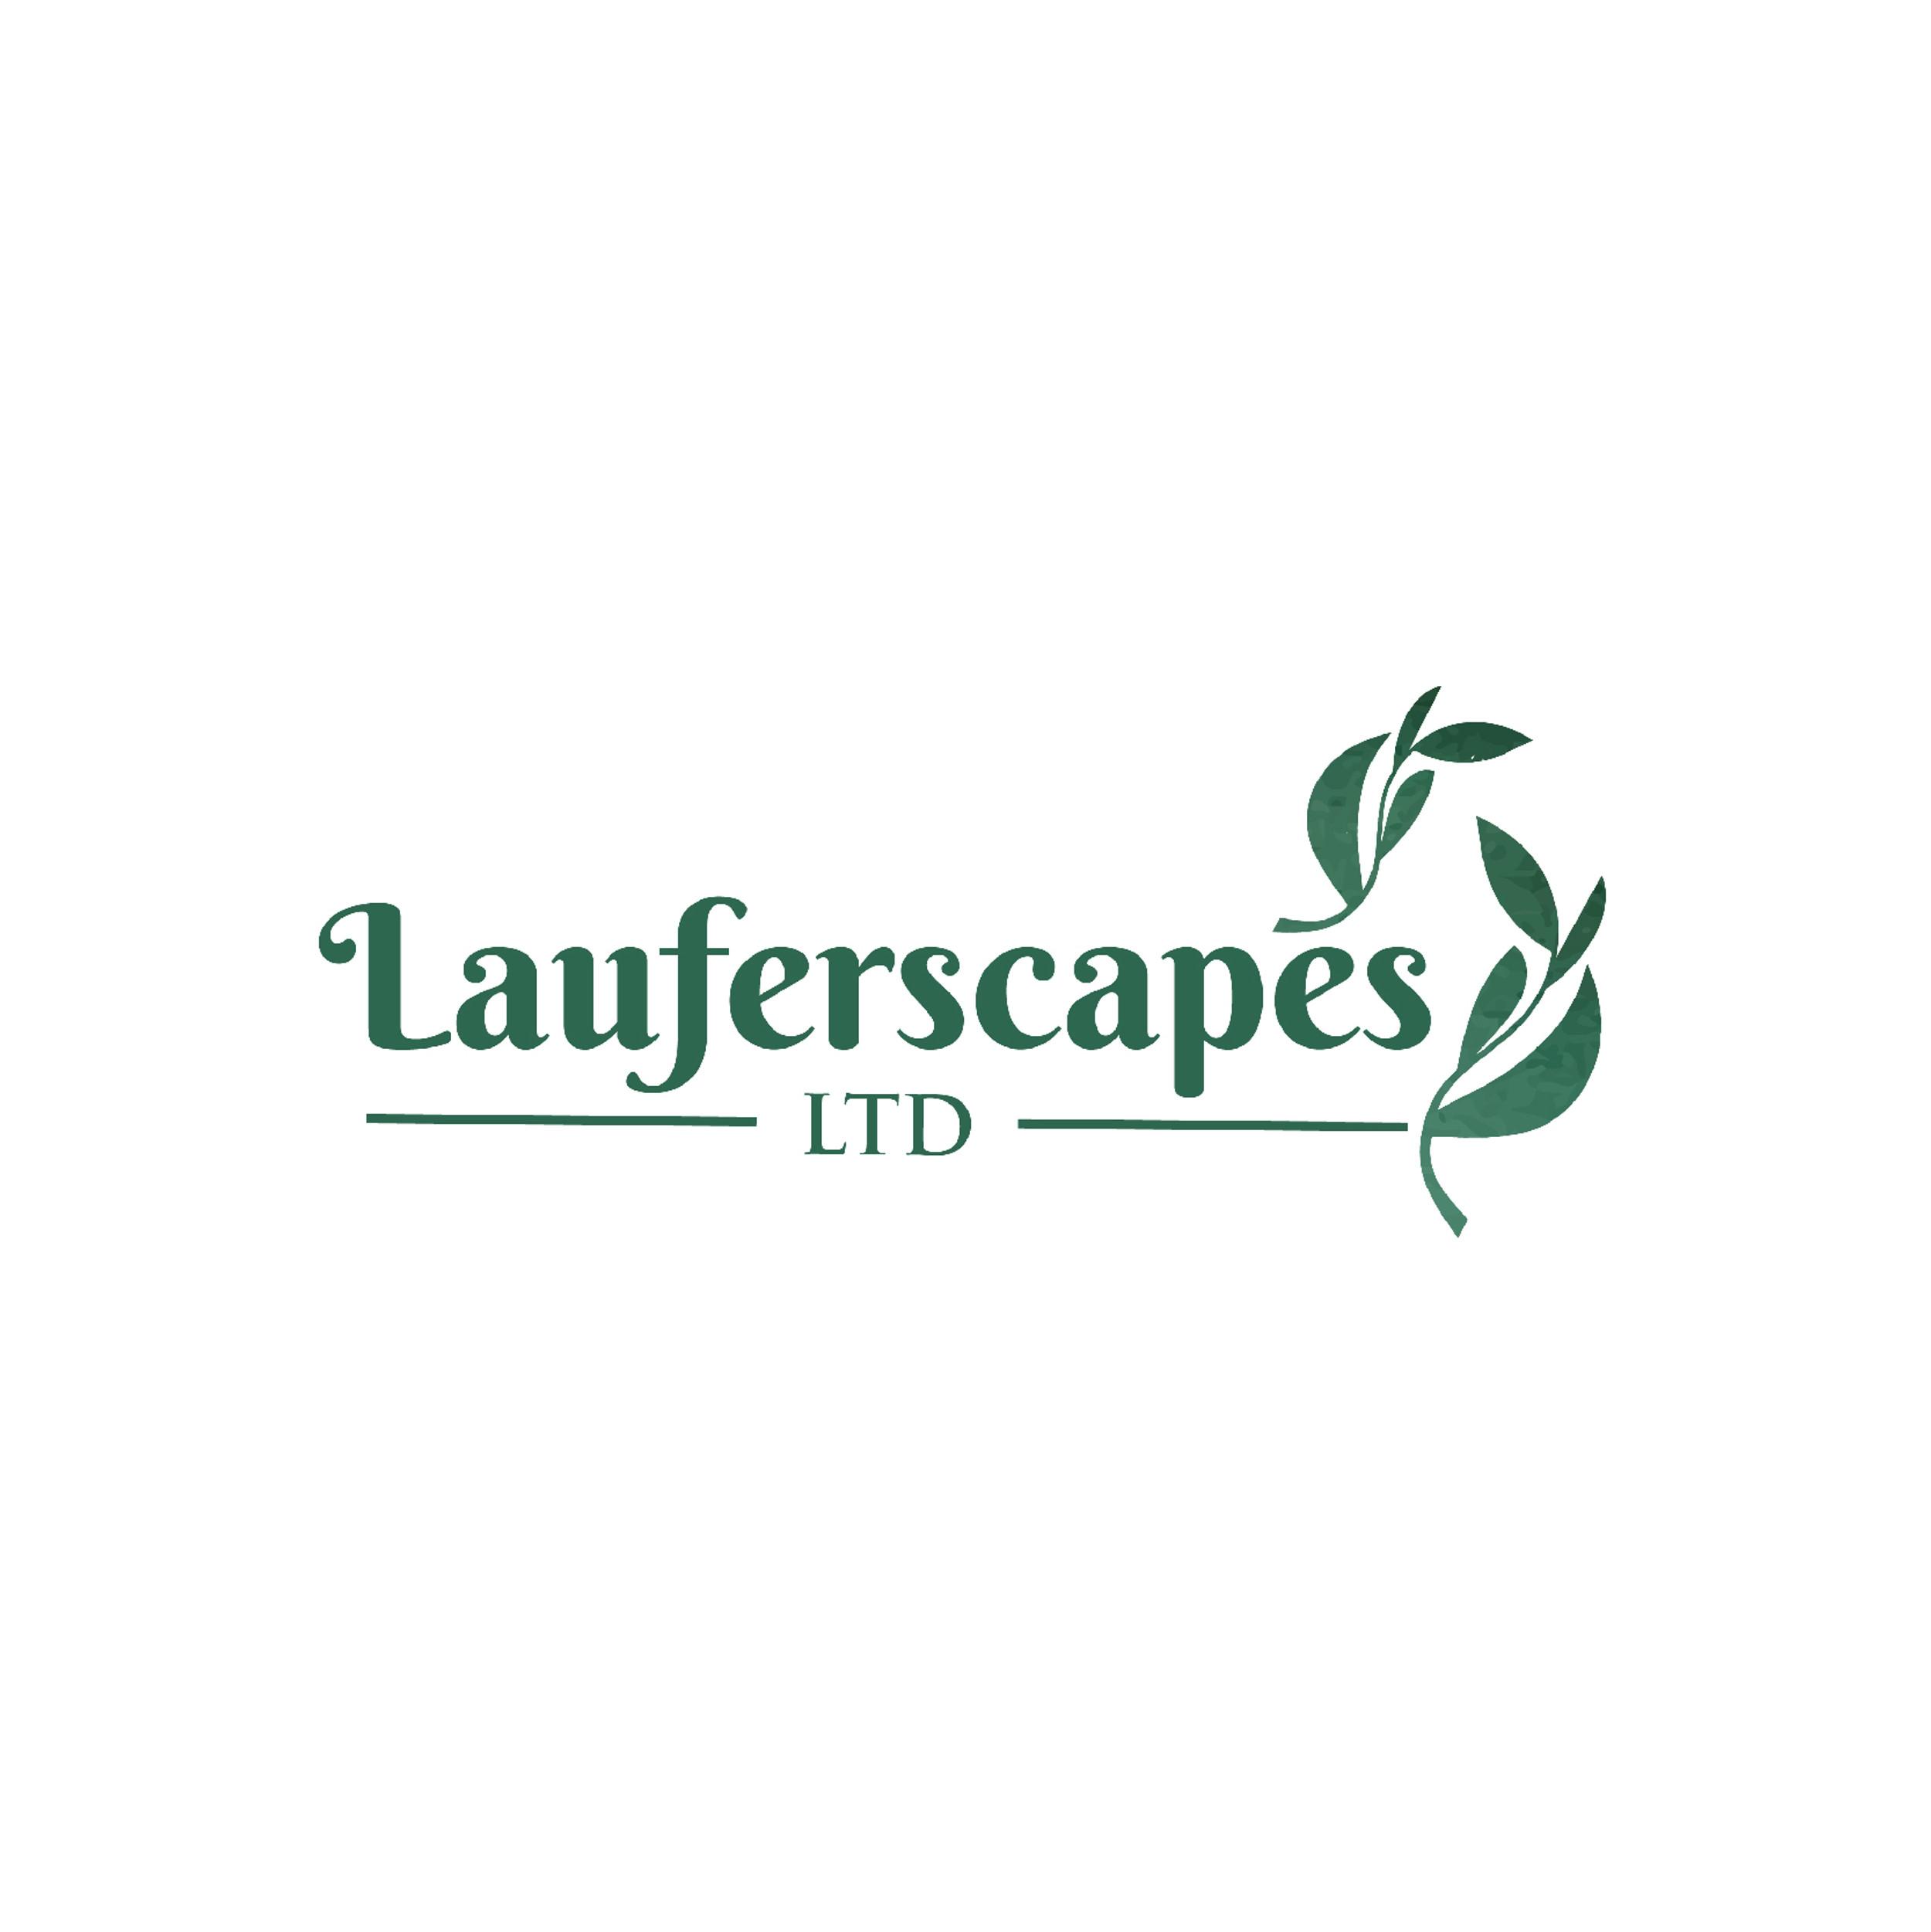 Lauferscapes Ltd logo